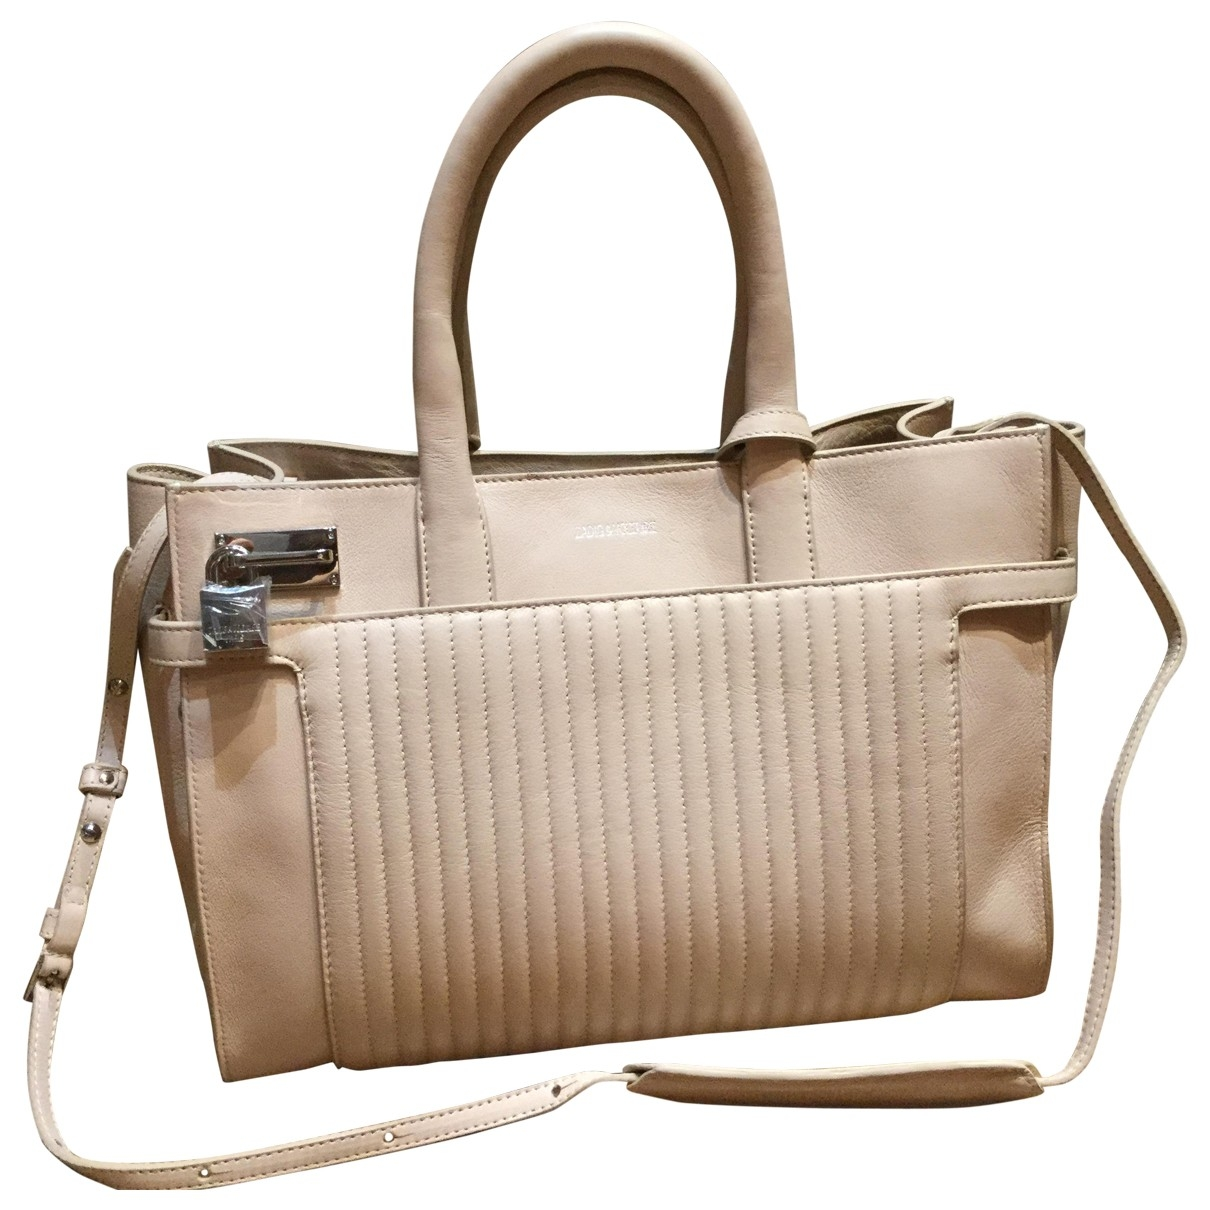 Zadig & Voltaire Candide Beige Leather handbag for Women \N